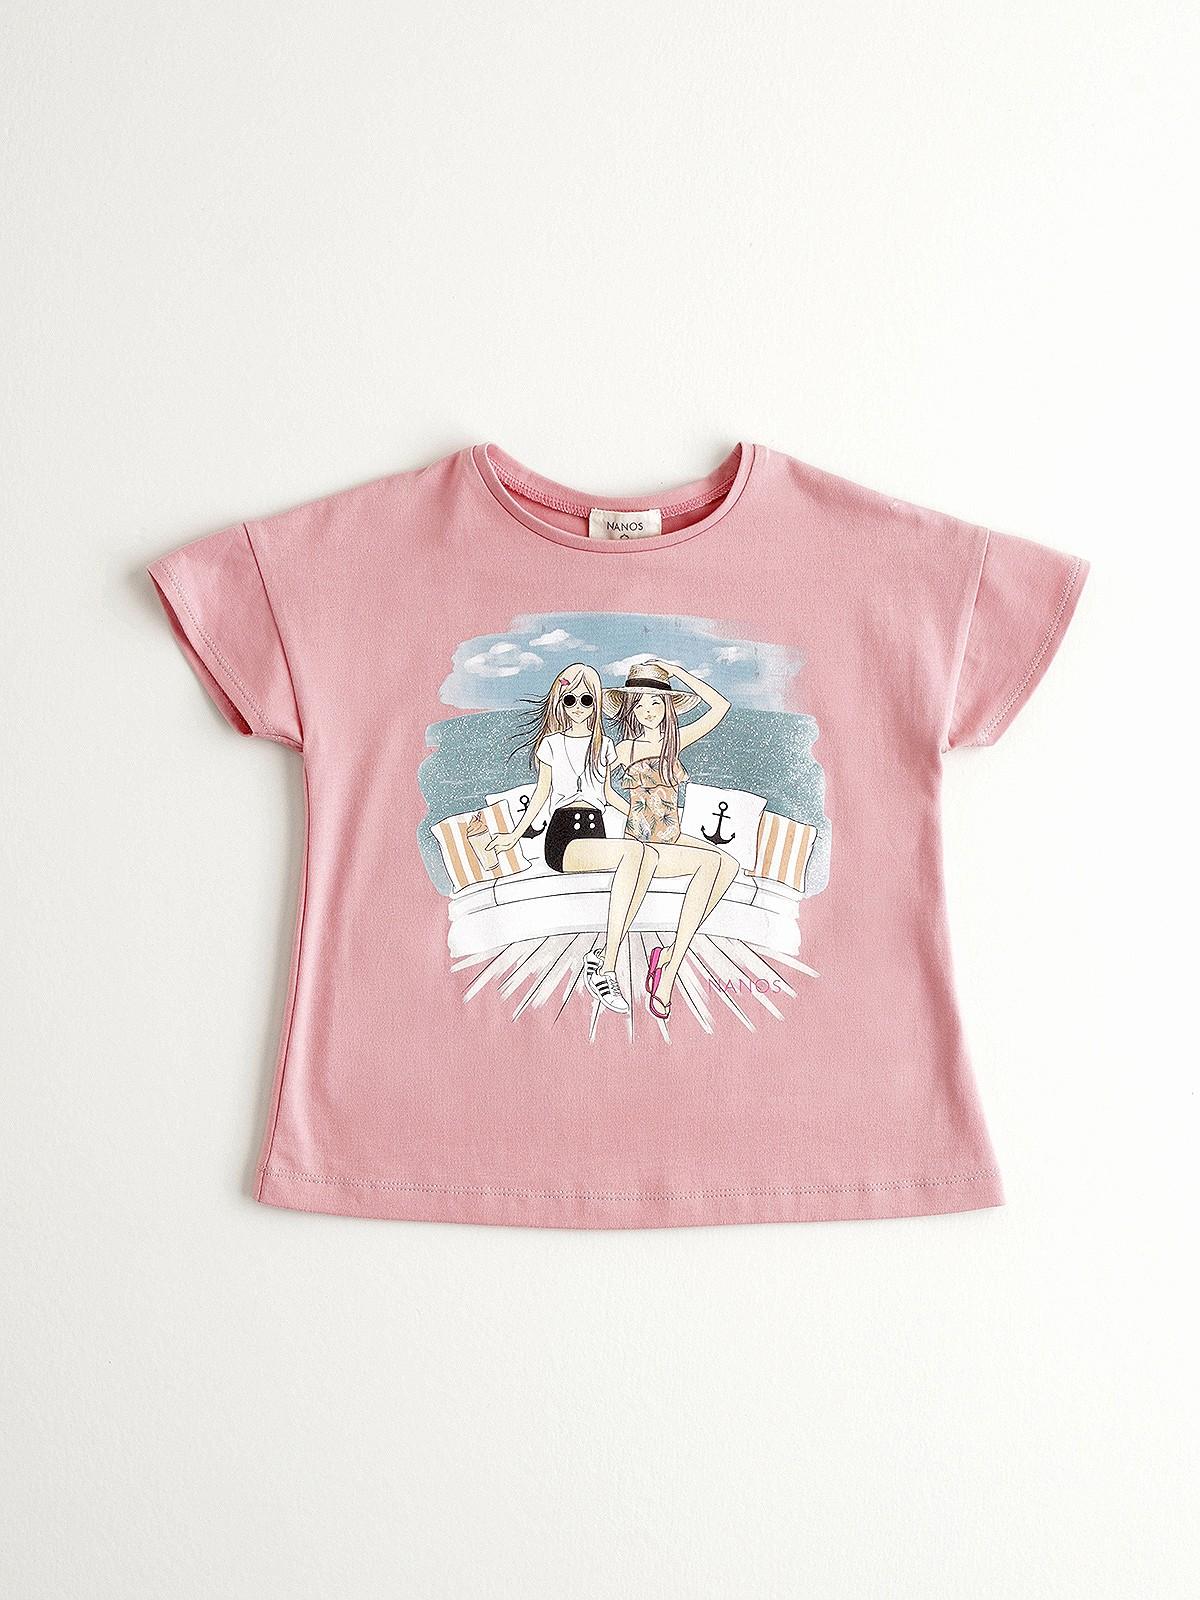 NANOS 粉色純棉上衣